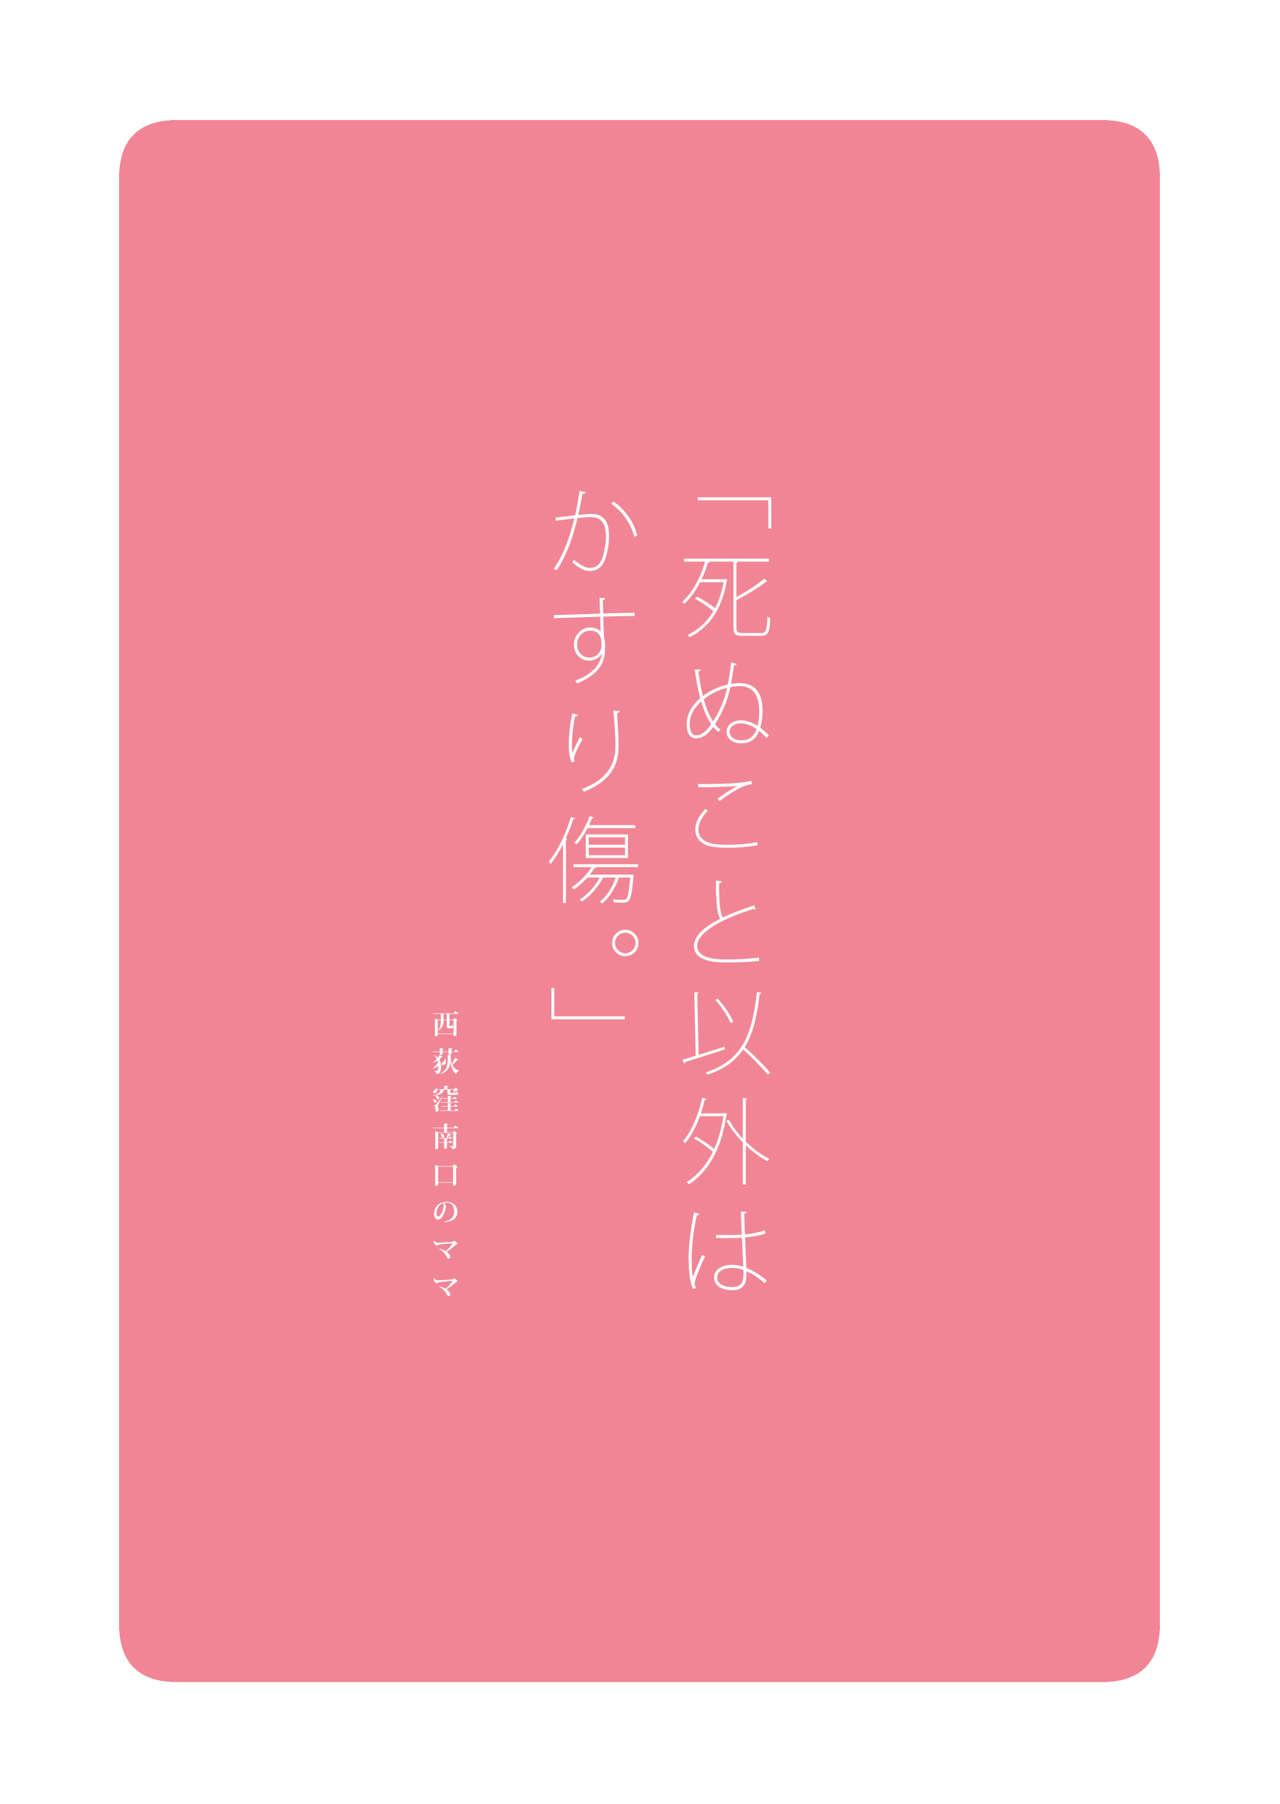 Isogasii Okaasan No Tamuno Sasa Rouzin Seikaigo | Guide for Elderly Sex Health Care to Busy Mom 67